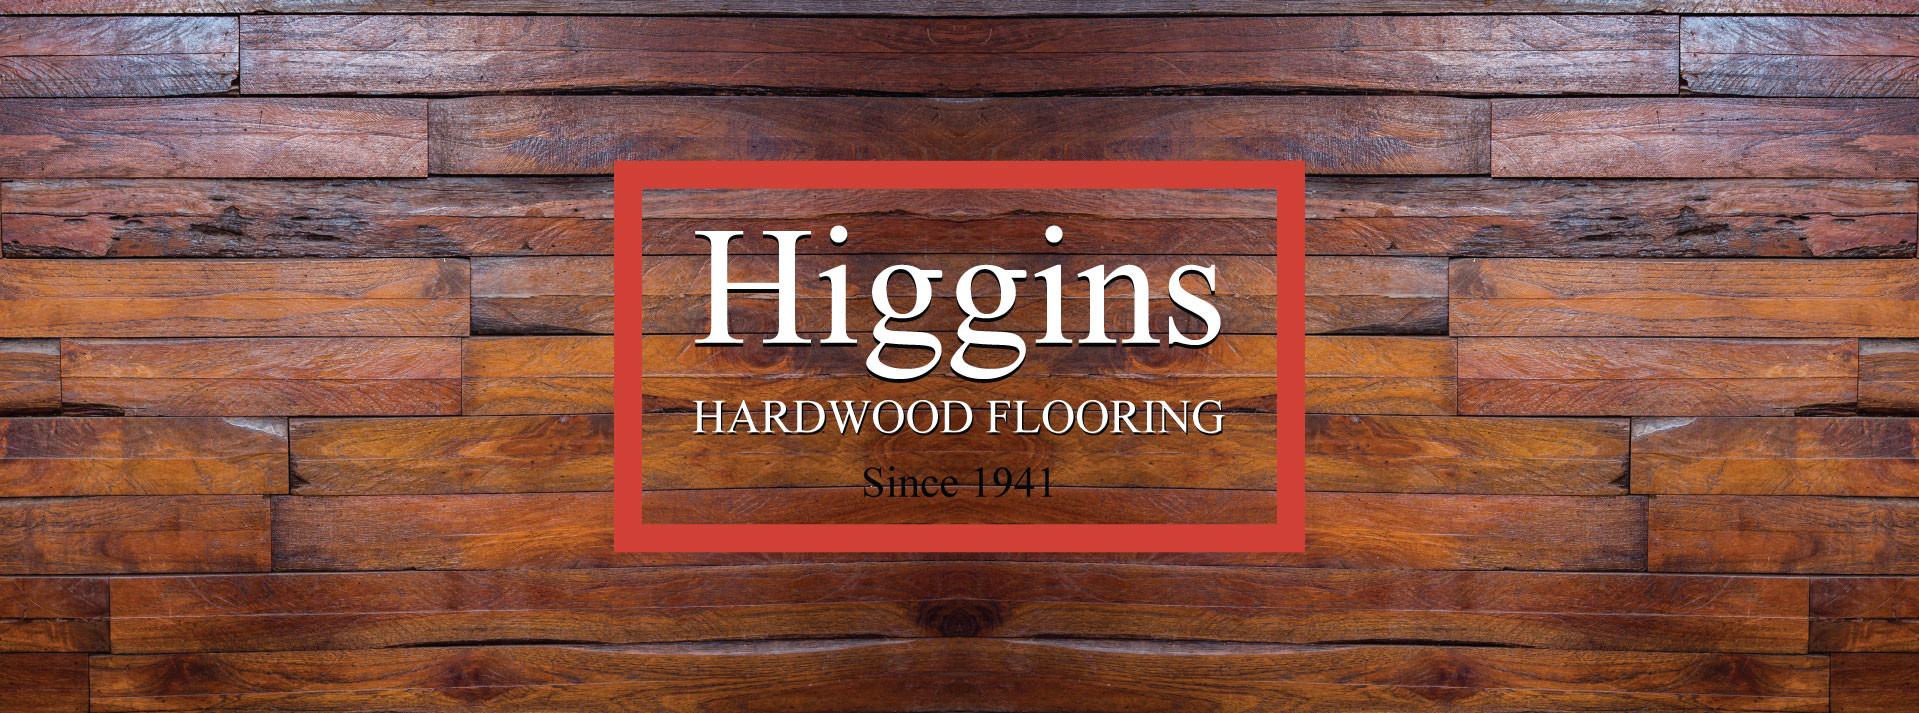 hardwood flooring dealers near me of higgins hardwood flooring in peterborough oshawa lindsay ajax regarding office hours